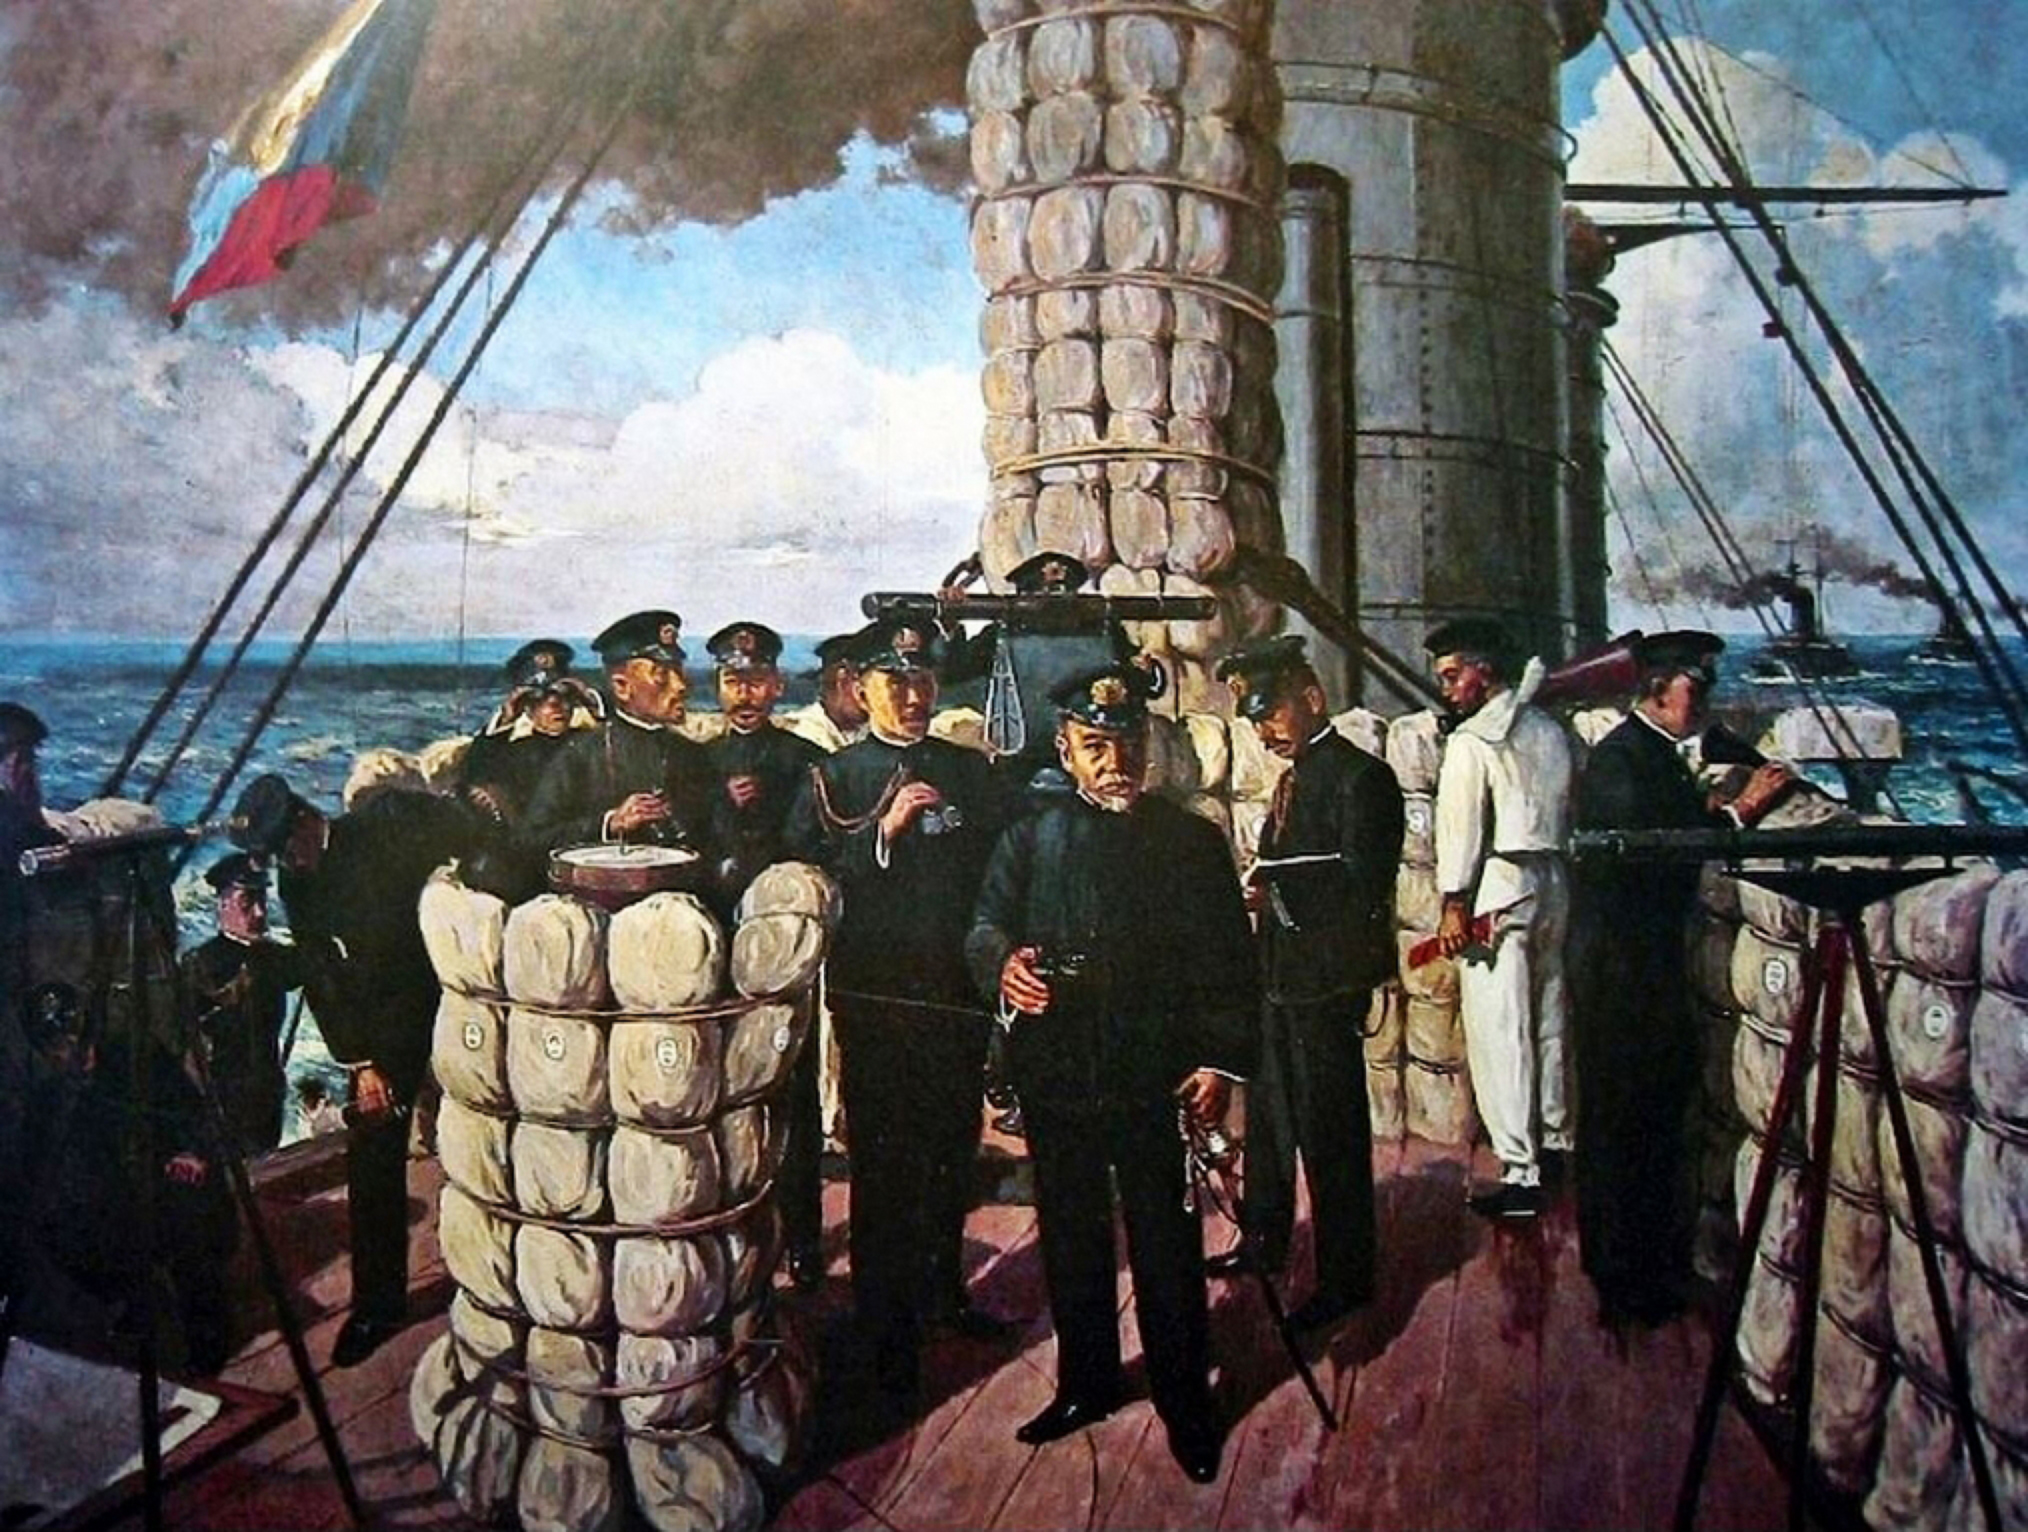 Admiral Tōgō Heihachirō on the bridge of Mikasa, at the beginning of the Battle of Tsushima in 1905. The signal flag being hoisted is the letter Z, which was a special instruction to the Fleet. Left to right: messenger Yamazaki Genki, navigator Second Lieutenant Edahara Yurikazu, staff Major Iida Hisatsune, chief navigator Lieutenant Colonel Nunome Mitsuzō, aide-de-camp of gunnery officer Lieutenant Imamura Nobujirō, captain of Mikasa Captain Ijichi Hikojirō, gunnery officer Major Abo Kiyokazu, 4th grade sailor Noguchi Shinzō, chief of staff Rear-Admiral Katō Tomosaburō, measurement officer Cadet Lieutenant Hasegawa Kiyoshi, Commander-in-chief of the Combined Fleet Tōgō Heihachirō, staff Lieutenant Colonel Akiyama Saneyuki, 1st grade sailor Miura Tadashi, cadet Tamaki Shinsuke 日本語: 東城鉦太郎『三笠艦橋之圖』 右から左へ:伝令・玉木信介少尉候補生、伝令・三浦忠一等信号兵、参謀・秋山真之中佐、連合艦隊司令長官・東郷平八郎大将、測的係・長谷川清少尉、参謀長・加藤友三郎少将、伝令・野口新蔵四等水兵、砲術長・安保清種少佐、艦長・伊地知彦次郎大佐、砲術長附・今村信次郎中尉、航海長・布目満造中佐、参謀・飯田久恒少佐、航海士・枝原百合一少尉、伝令・山崎厳亀少尉候補生